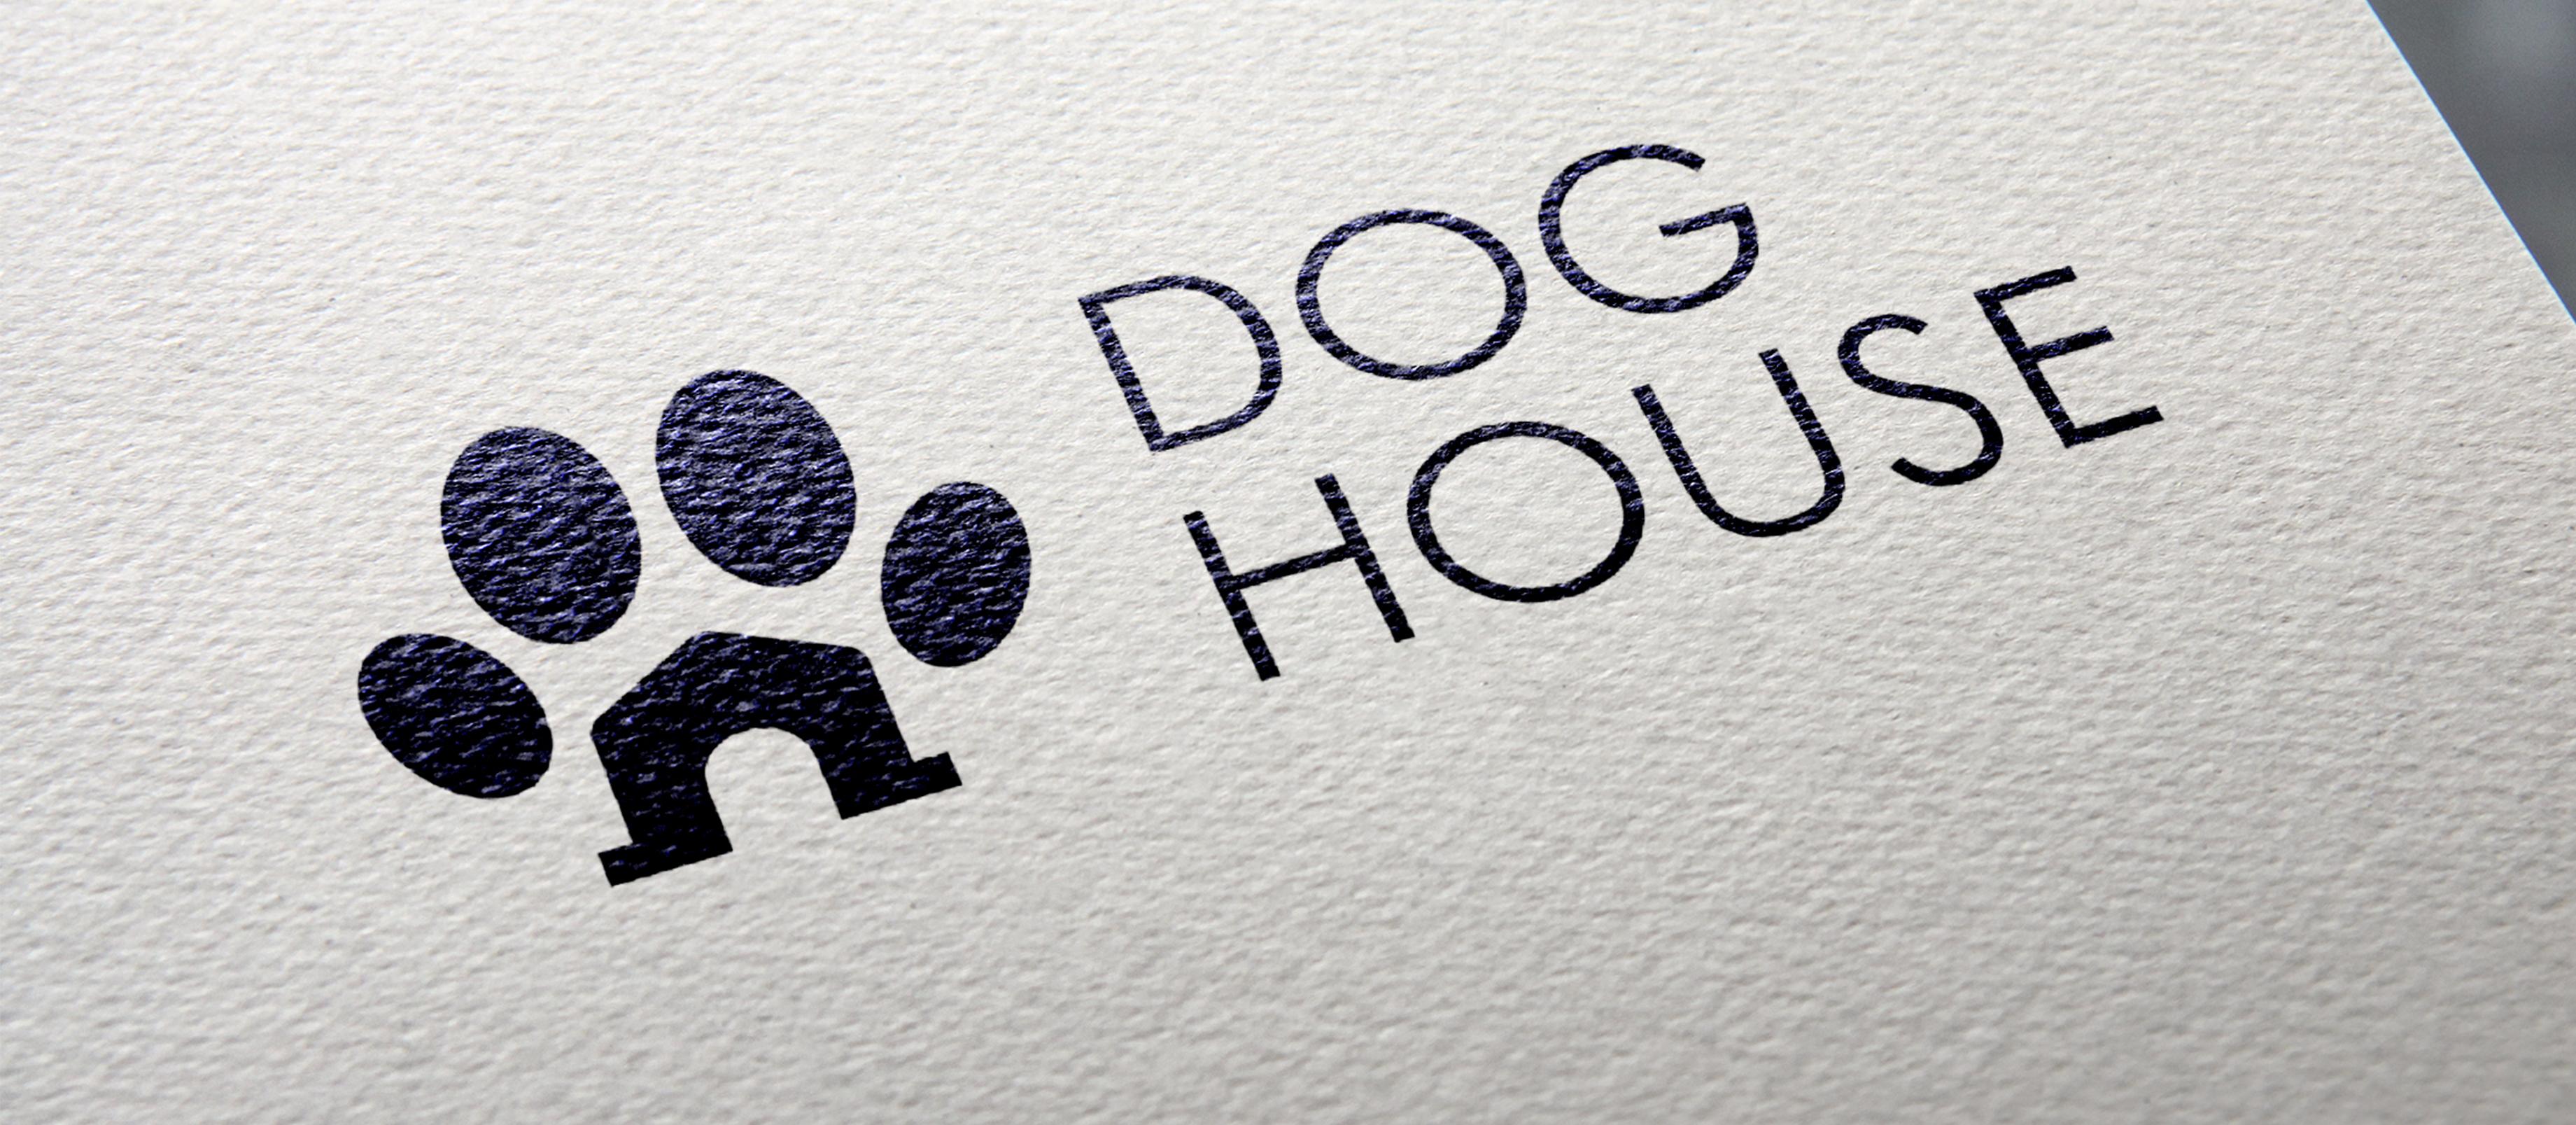 logo mockup dog food  https://www.linkedin.com/in/martin-andonov-445148163/